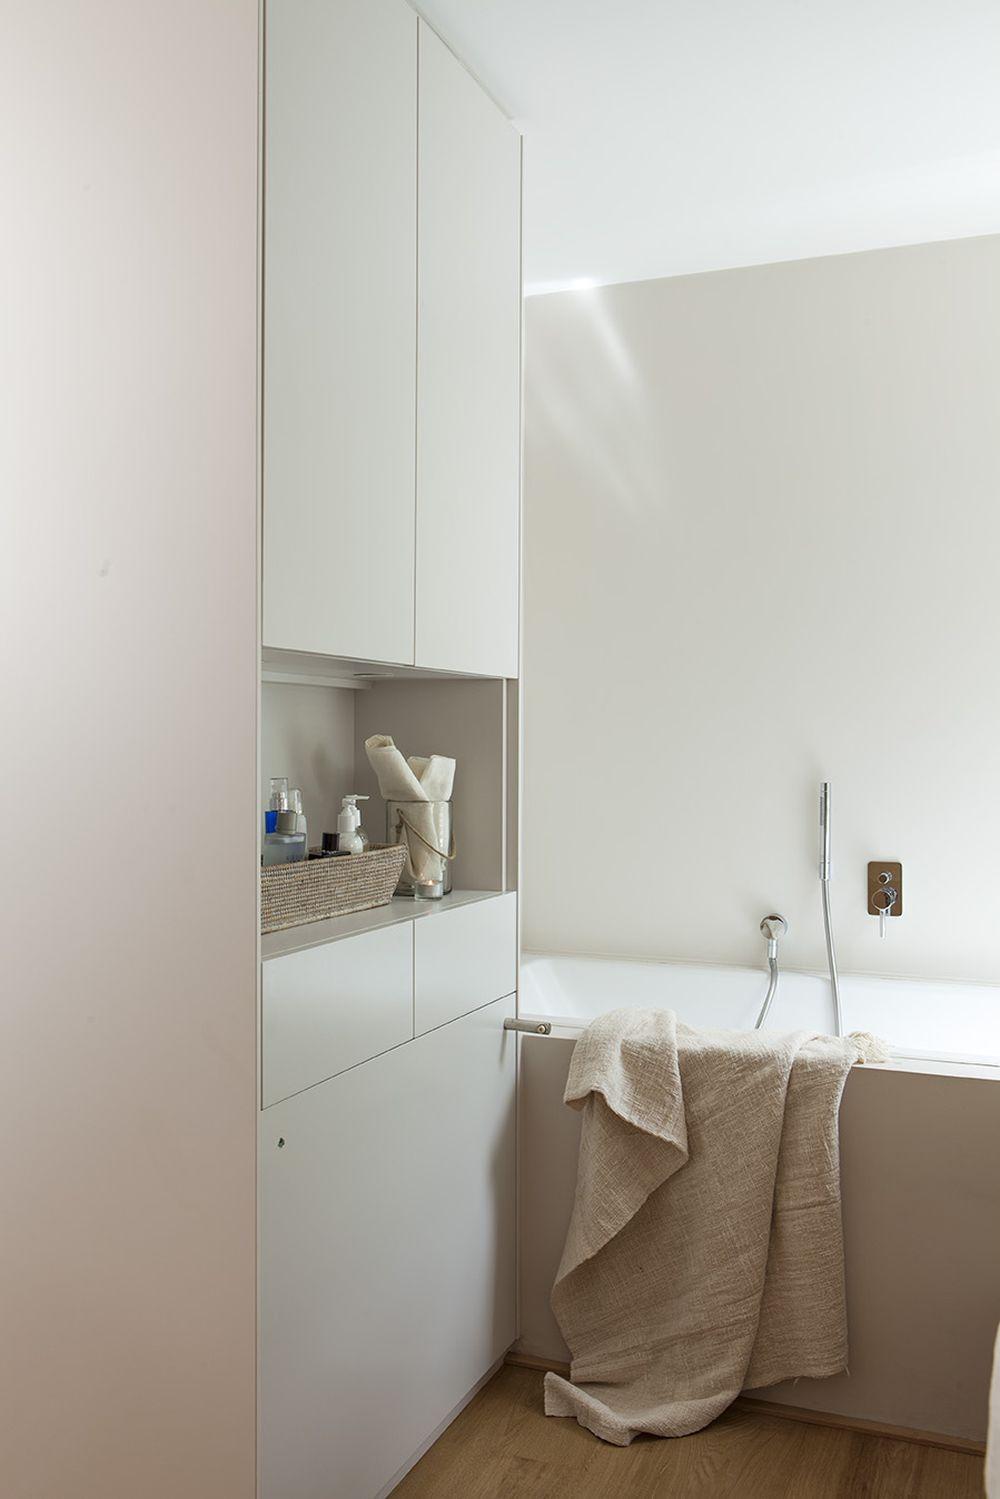 adelaparvu.com despre casa cu gradina, accente marine, designer Jeanette Dresing, Foto Feran Freixa (25)